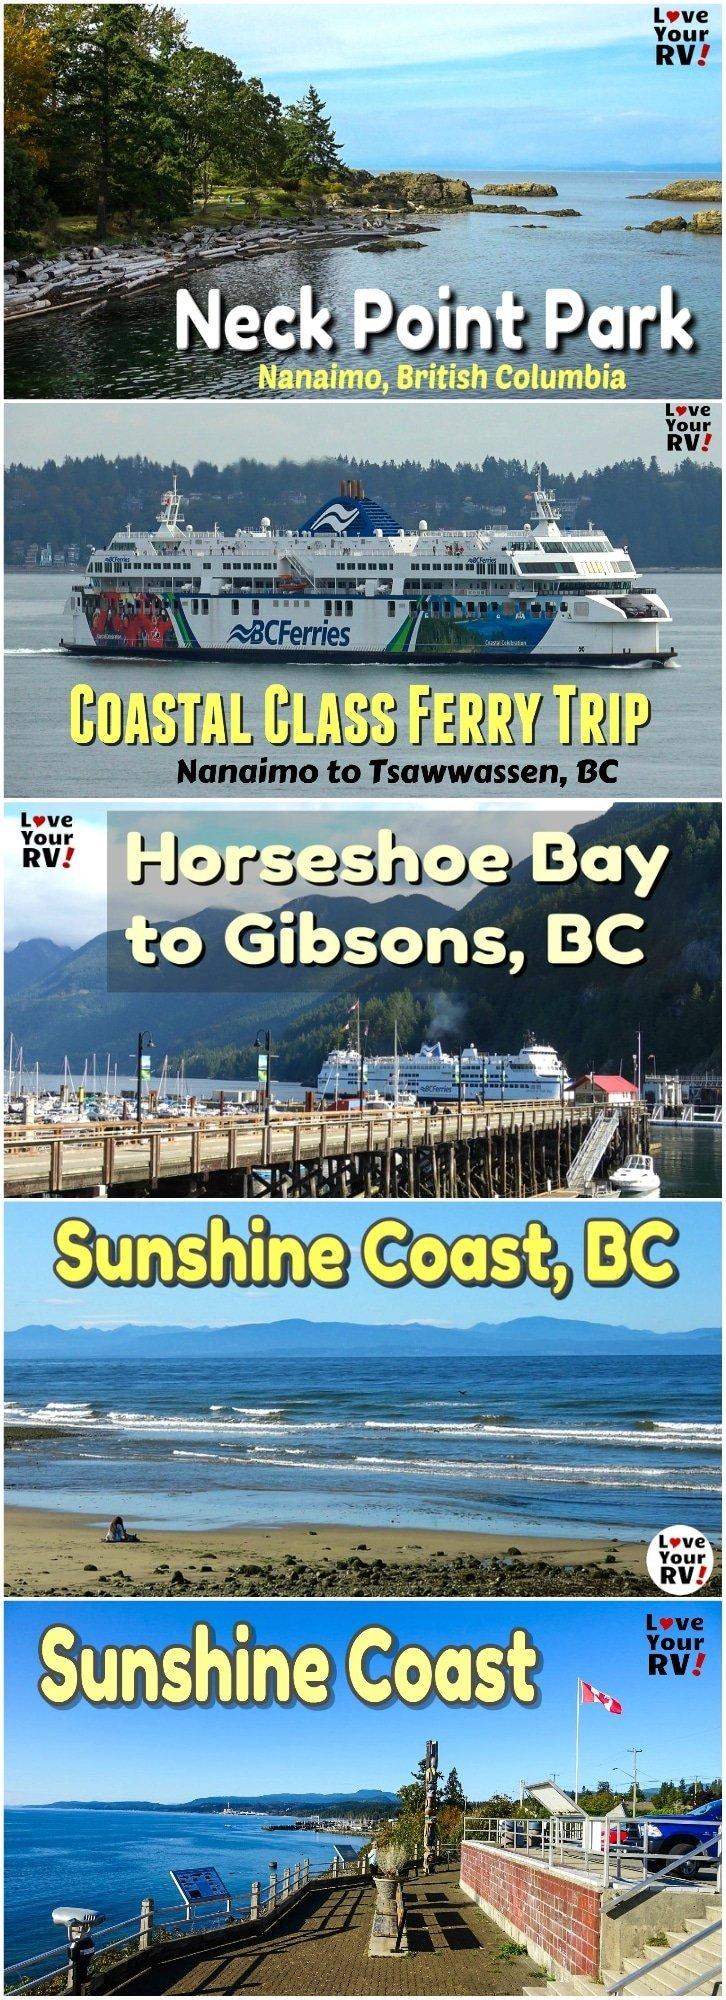 Getaway trip to Explore the Sunshine Coast of British Columbia